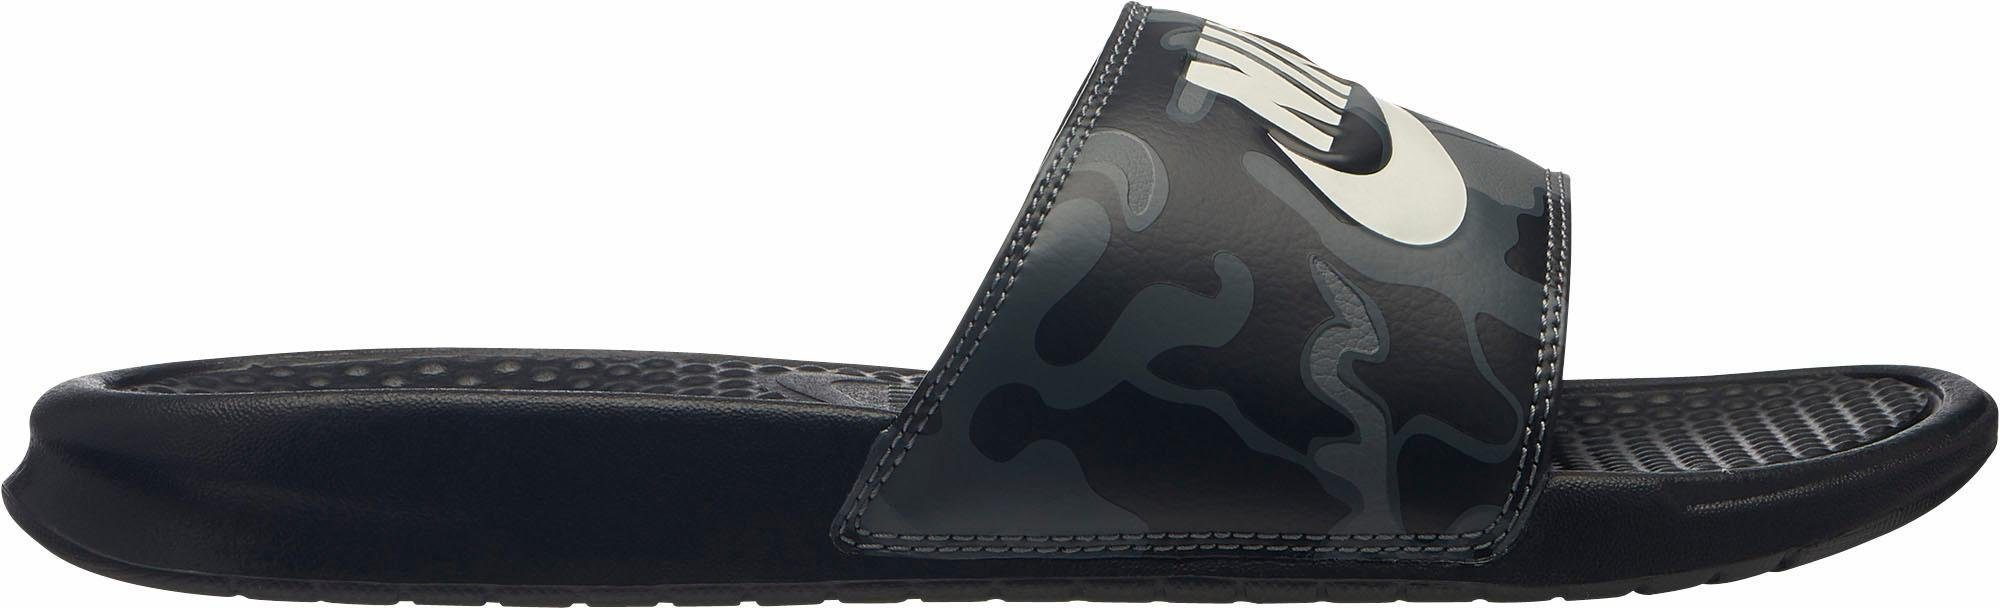 Nike Sportswear »Benassi Just do it Print« Badesandale